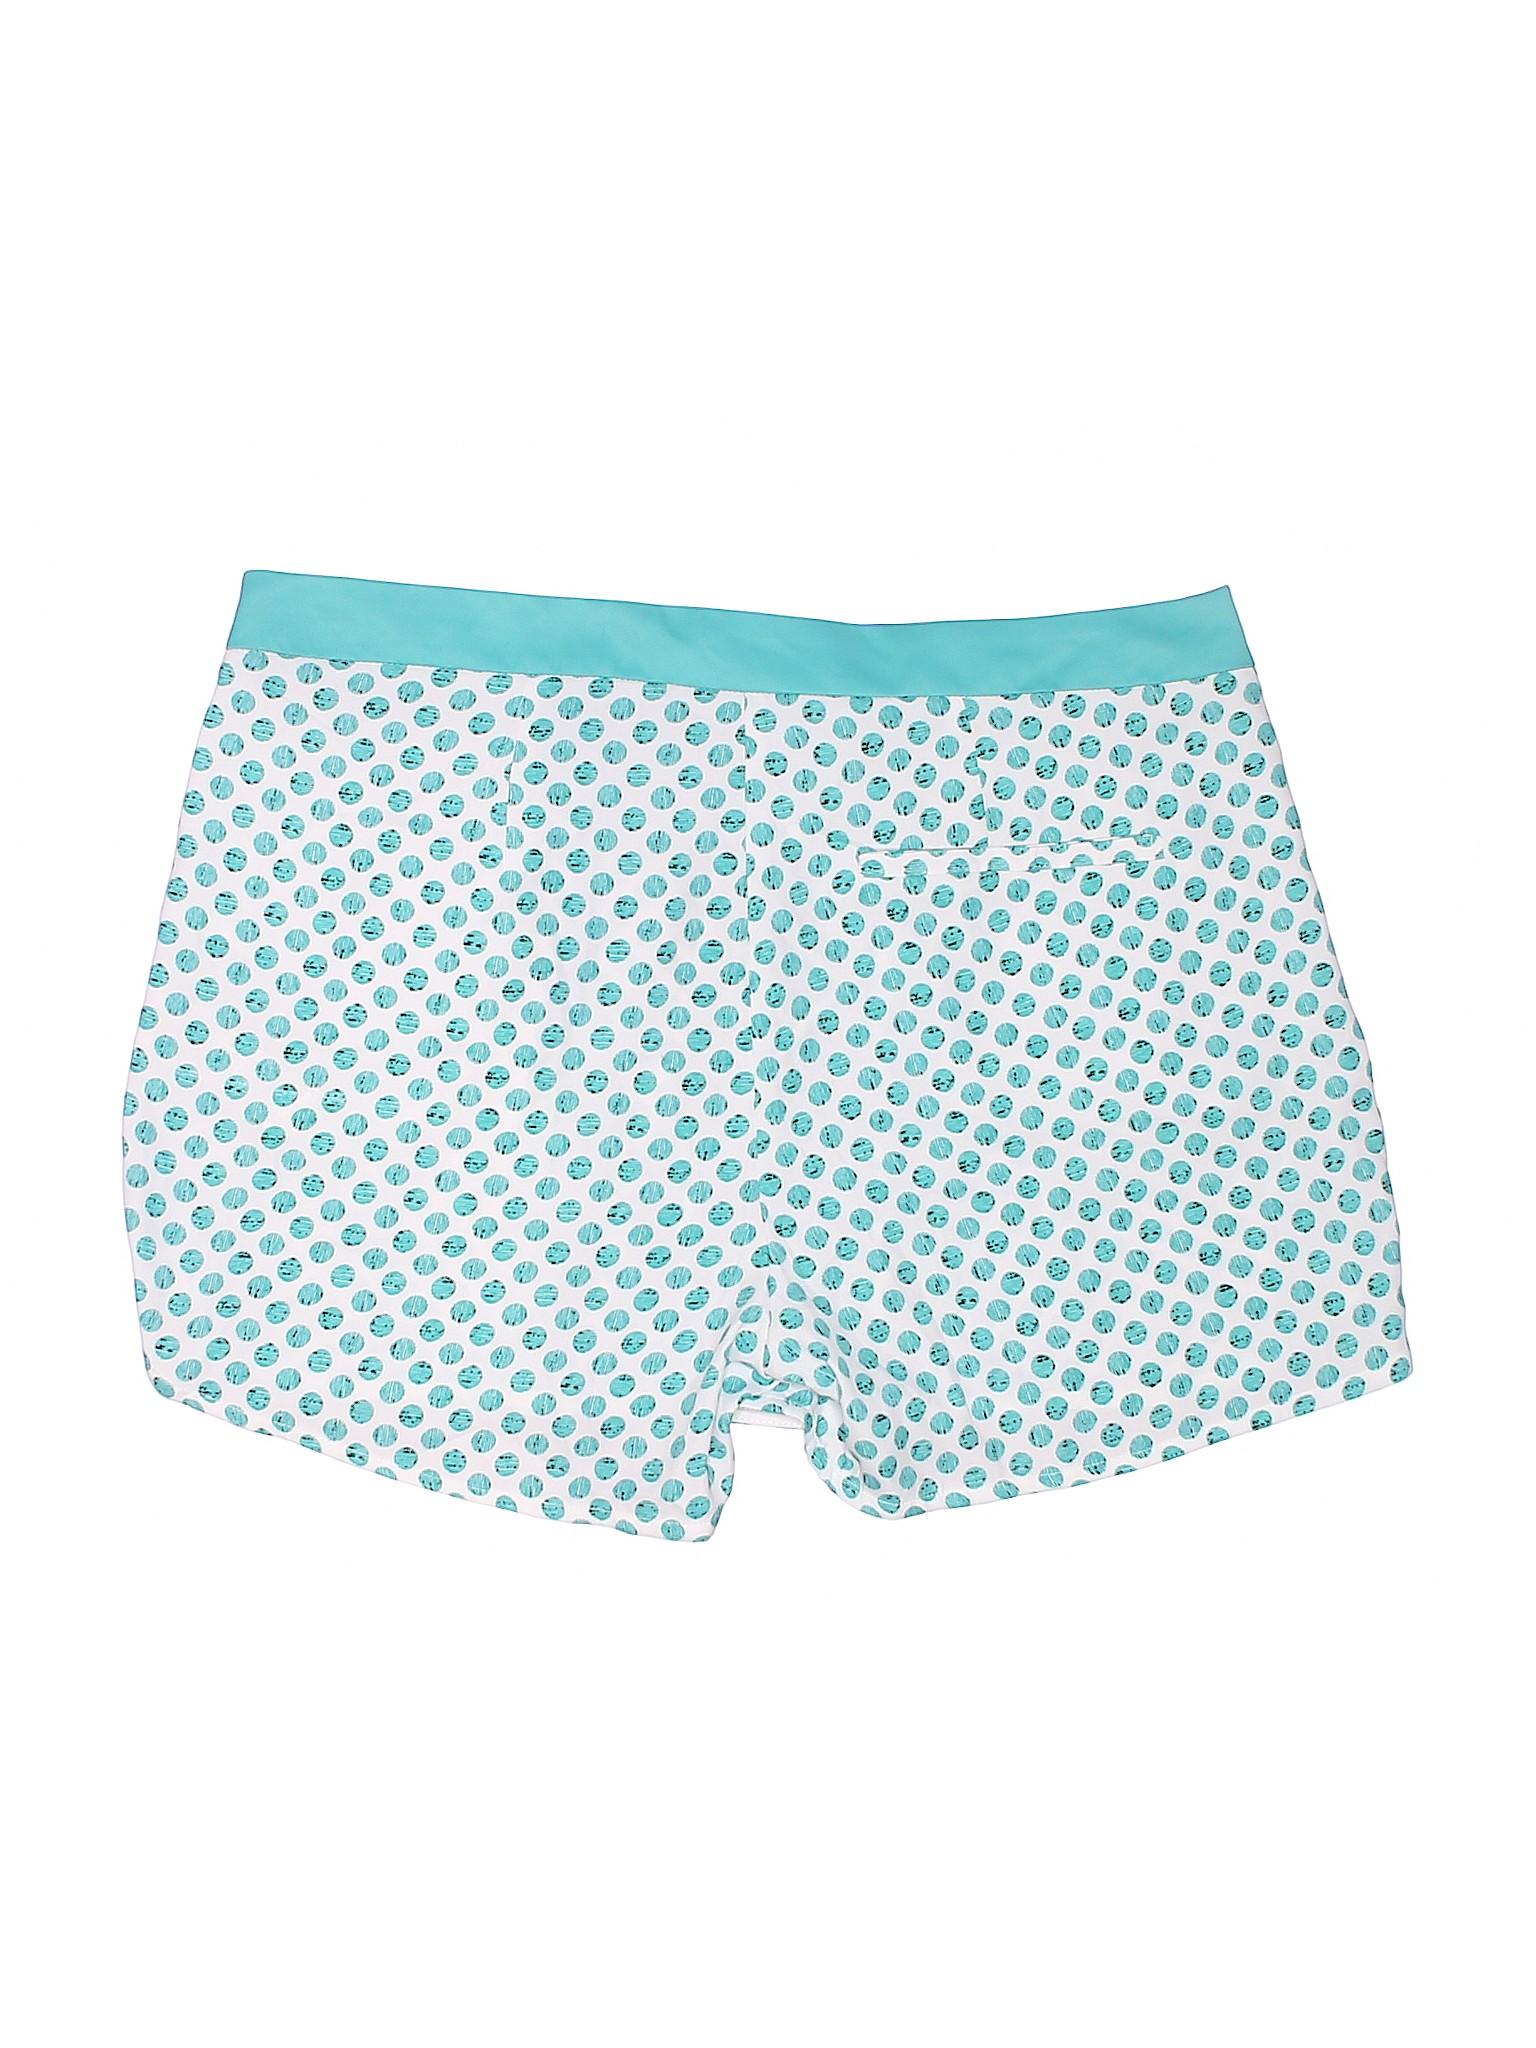 Boutique Zara Zara Zara Basic Zara Shorts Boutique Boutique Basic Shorts Shorts Basic Basic Shorts Boutique REvWTX7wq